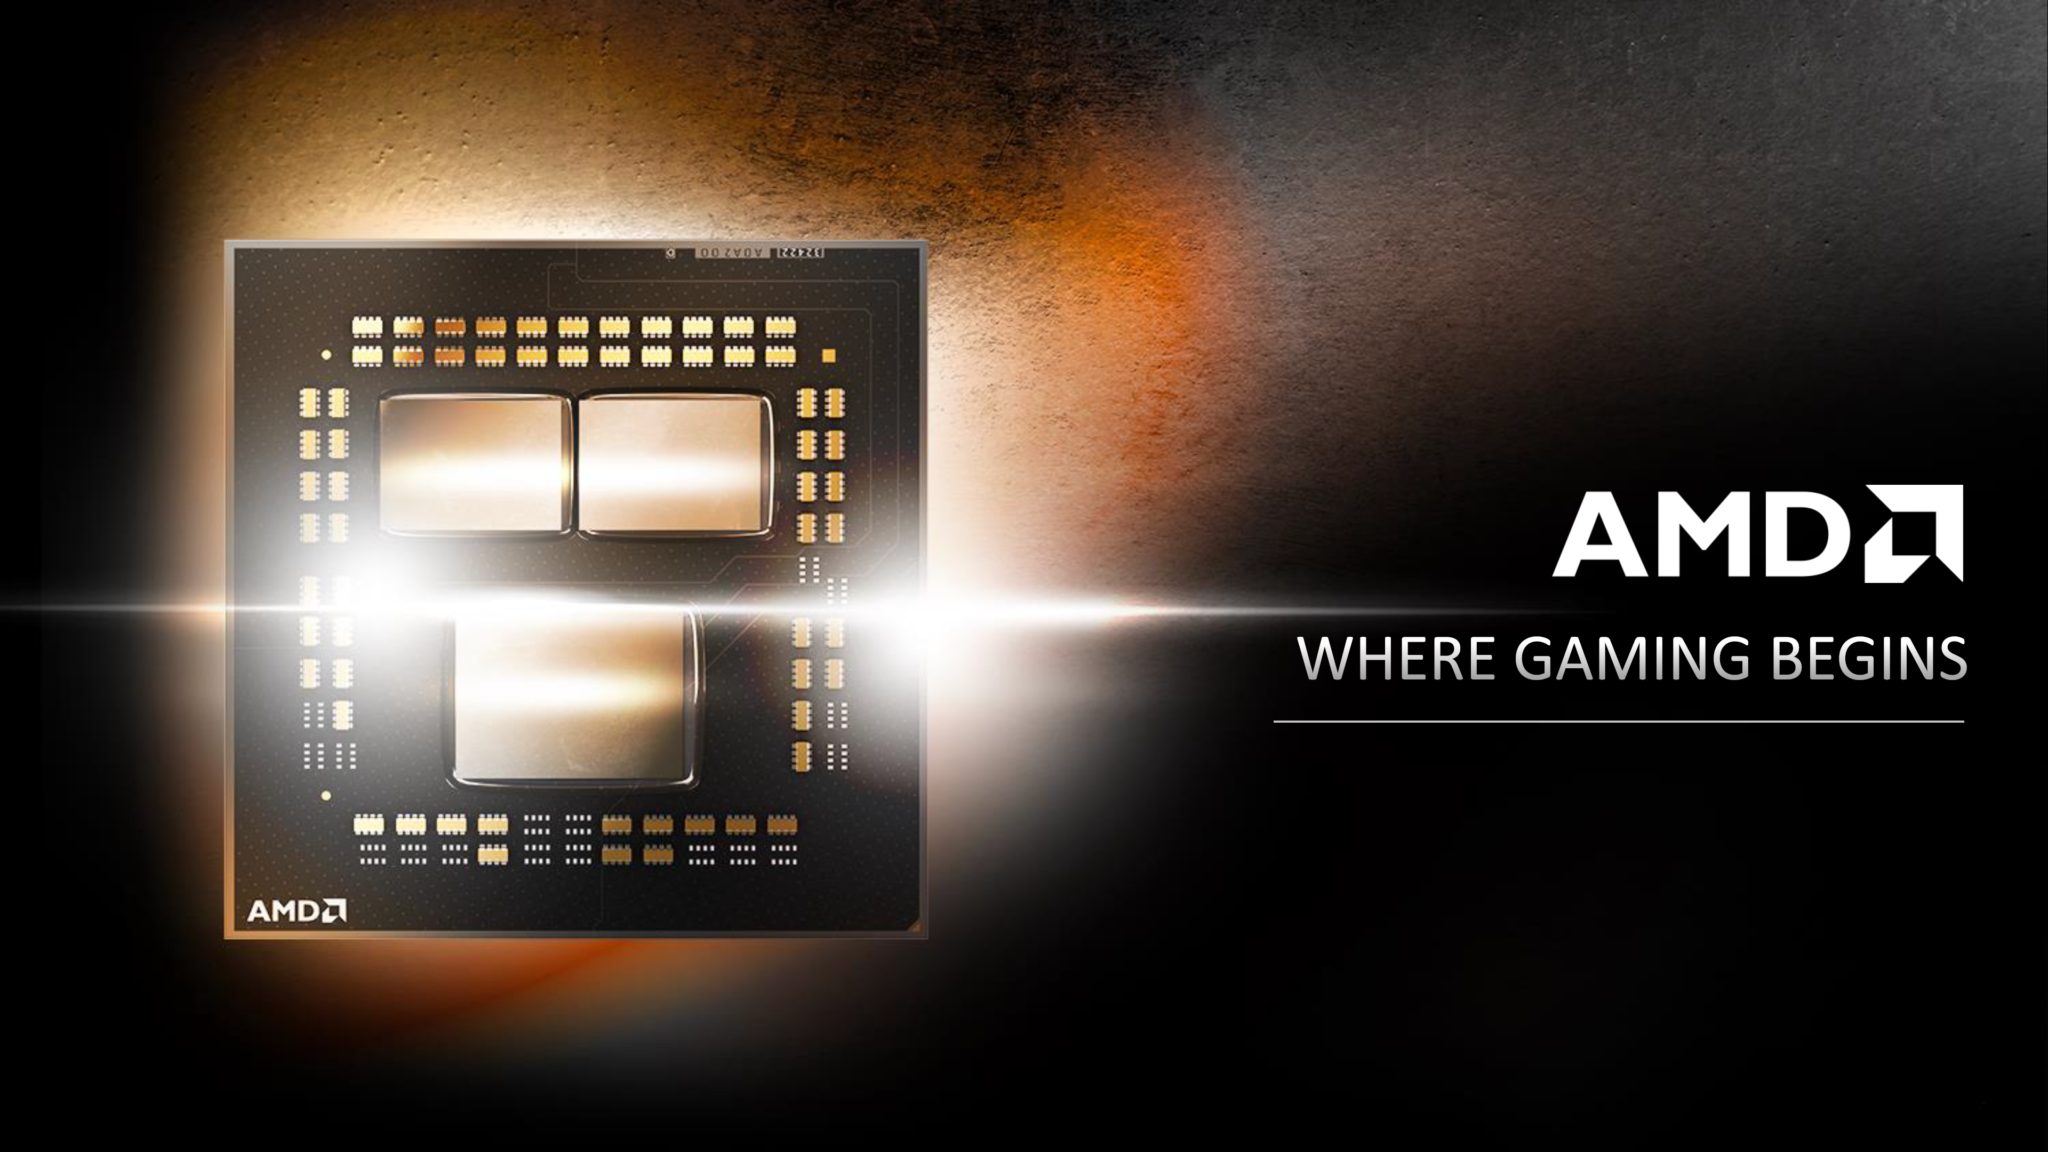 AMD Ryzen 9 5950XT & Ryzen 5 5600XT 'Zen 3' Refresh Desktop CPUs Possibly Sighted, Up To 5.0 GHz Clocks